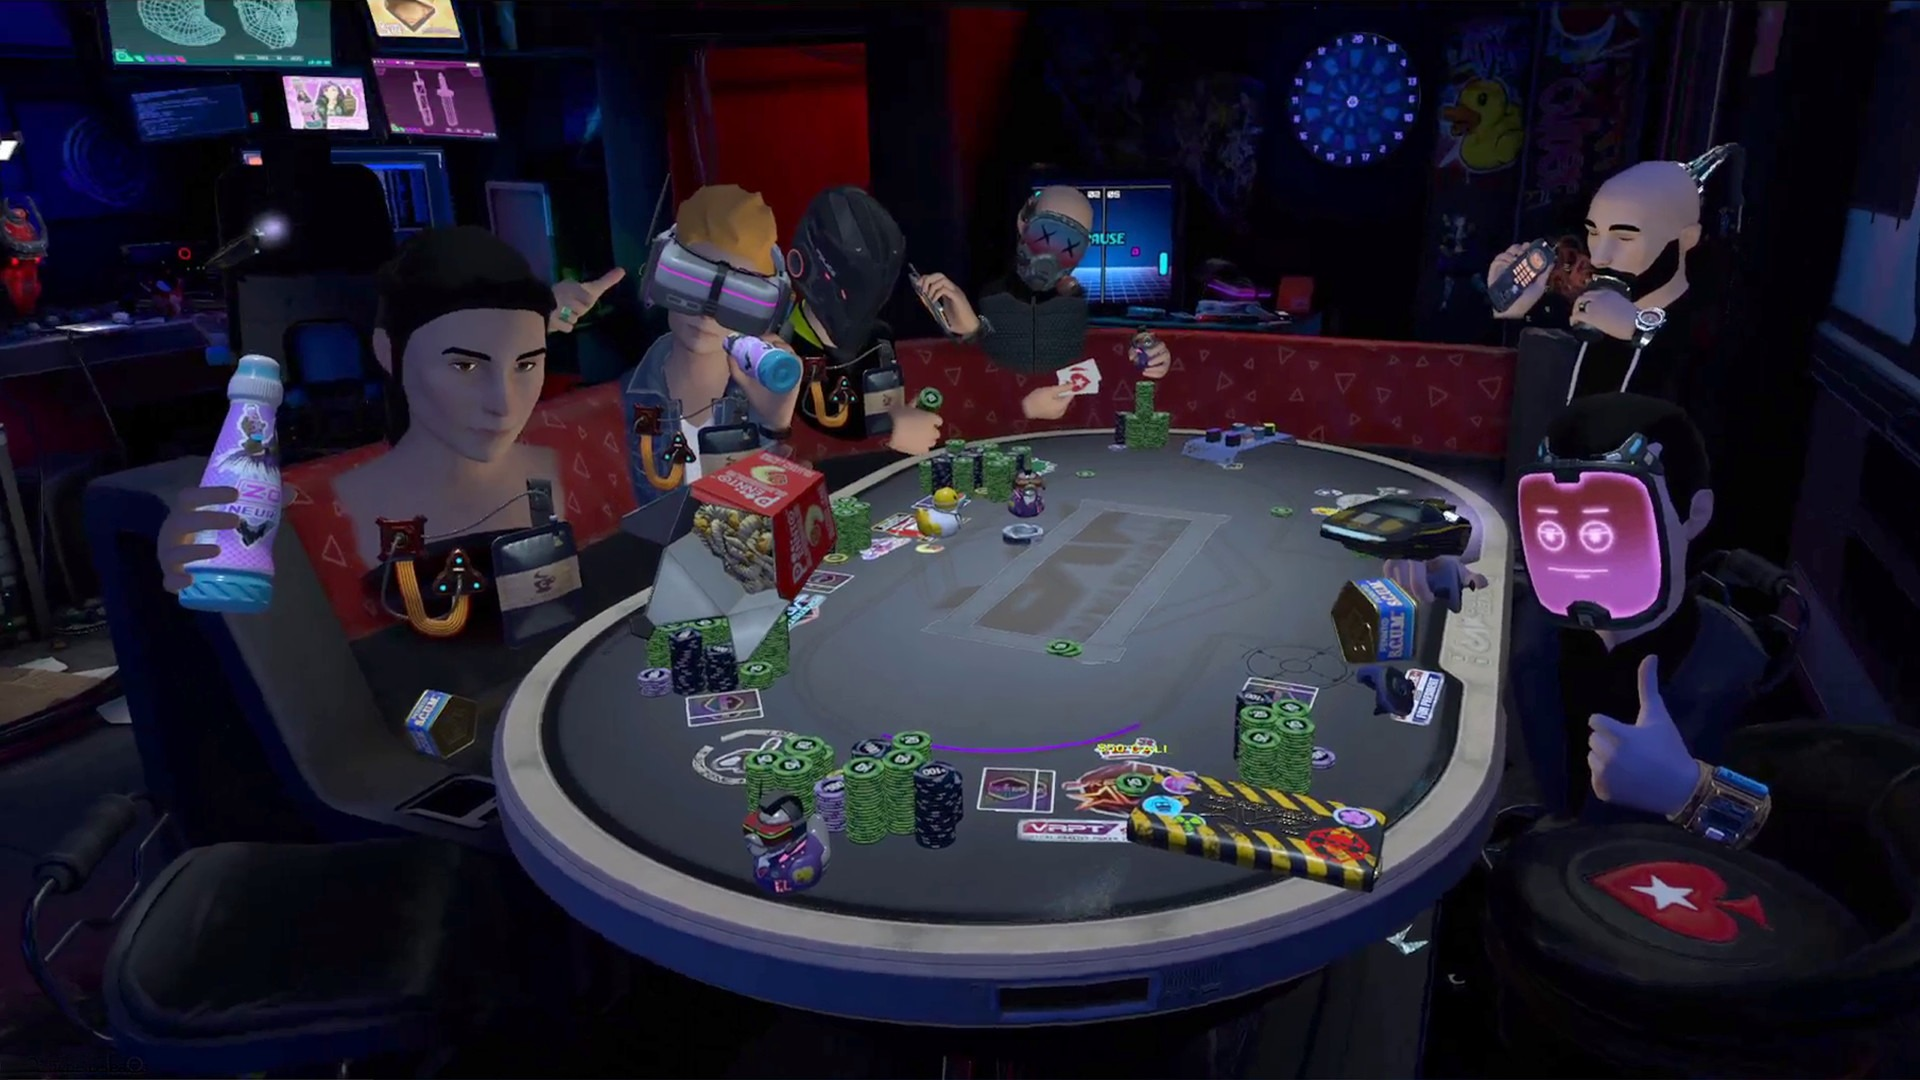 pokerstars vr gameplay wallpaper 73541